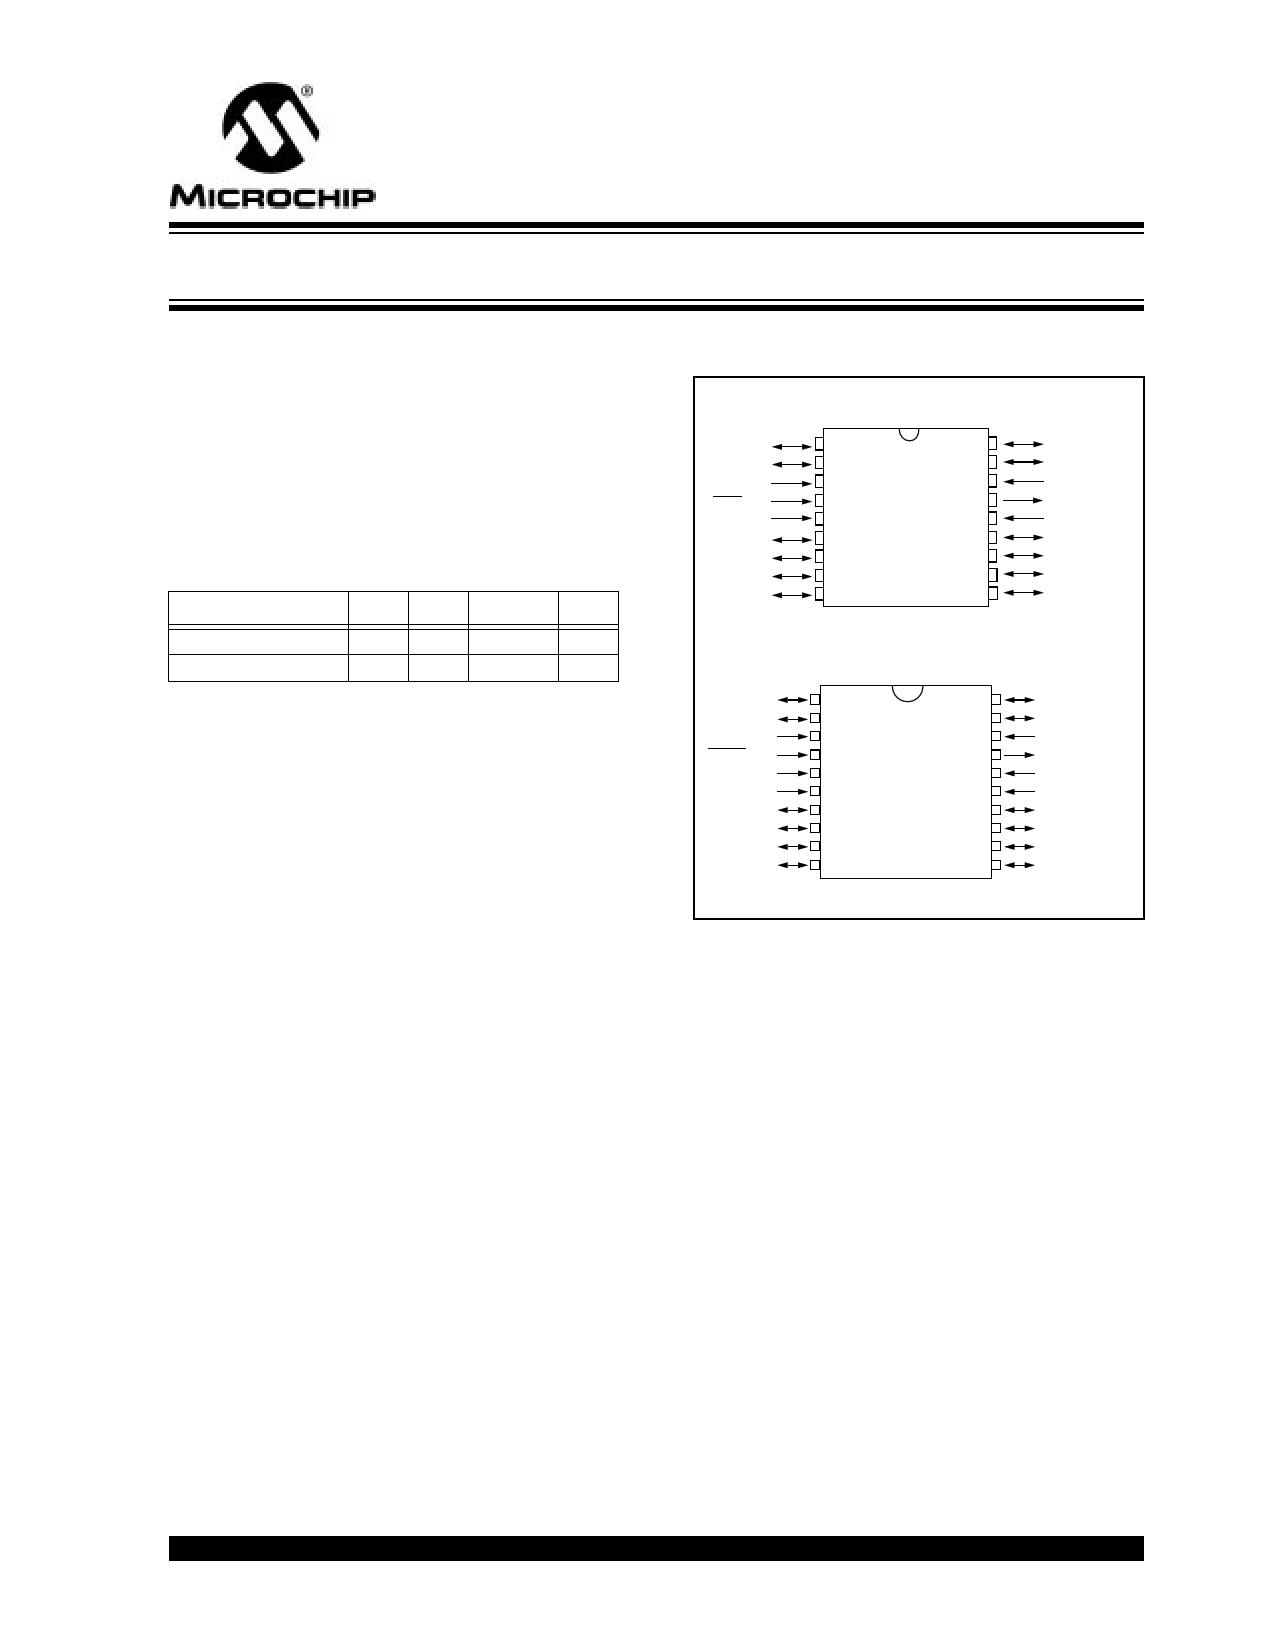 PIC16LV54A datasheet